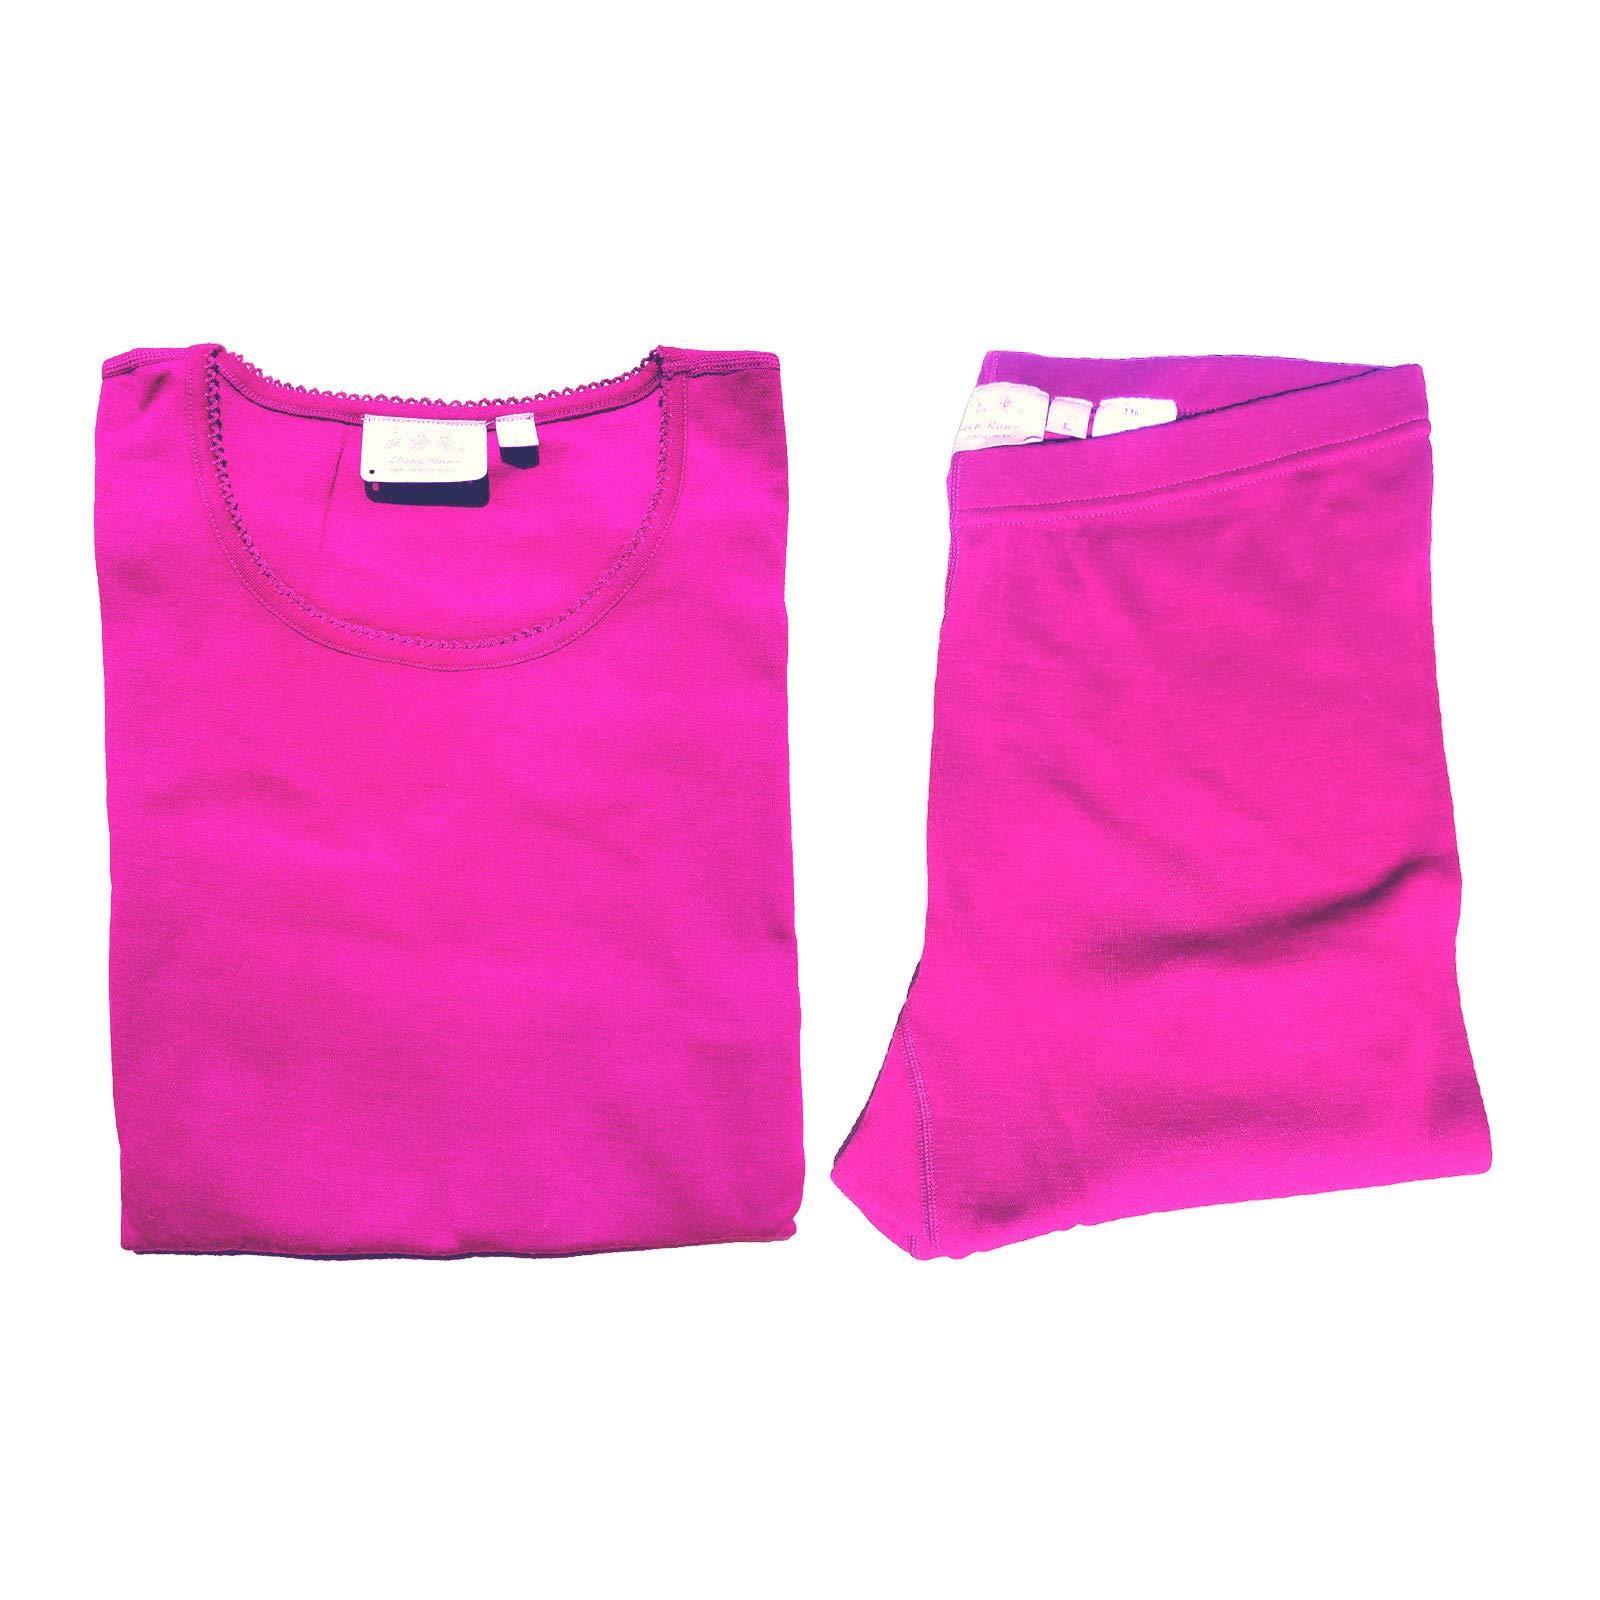 Sheep Run Womens 100% Merino Wool Thermal Underwear Top and Pants (Pink, Large) by Sheep Run